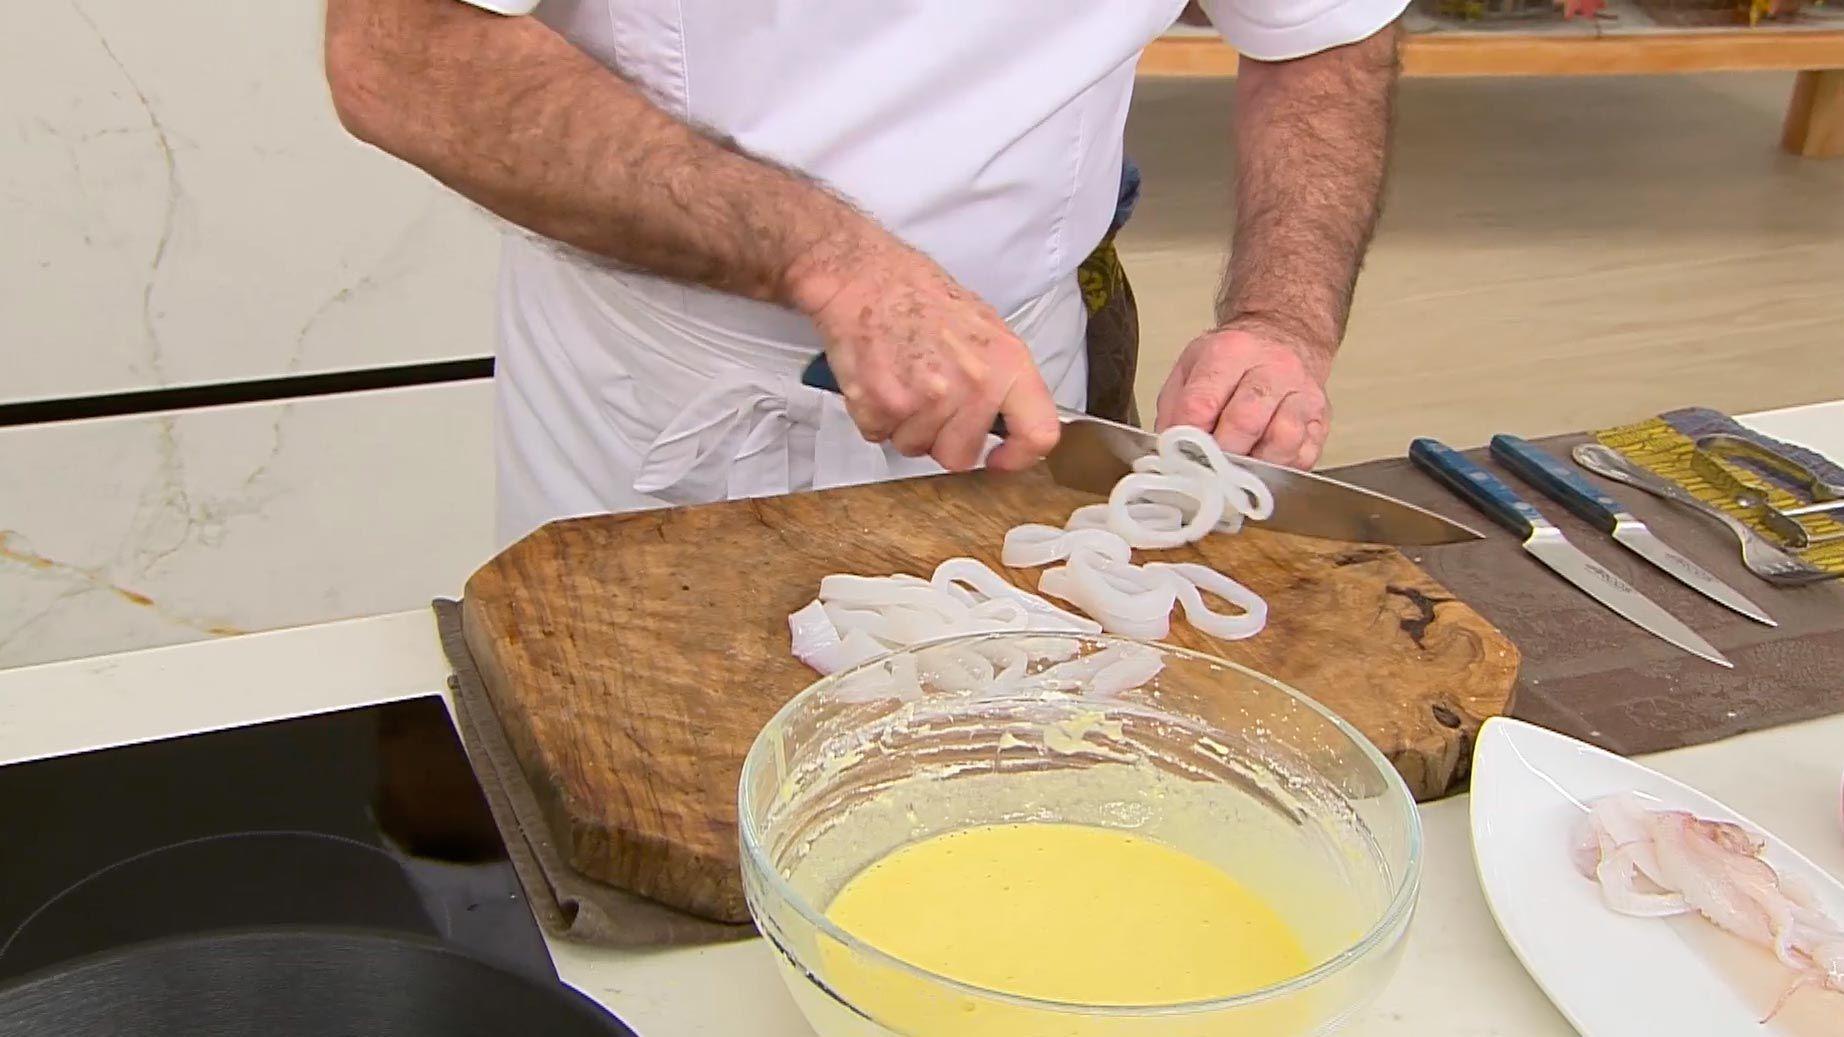 Rabas con salsa picante por Karlos Arguiñano - paso 2